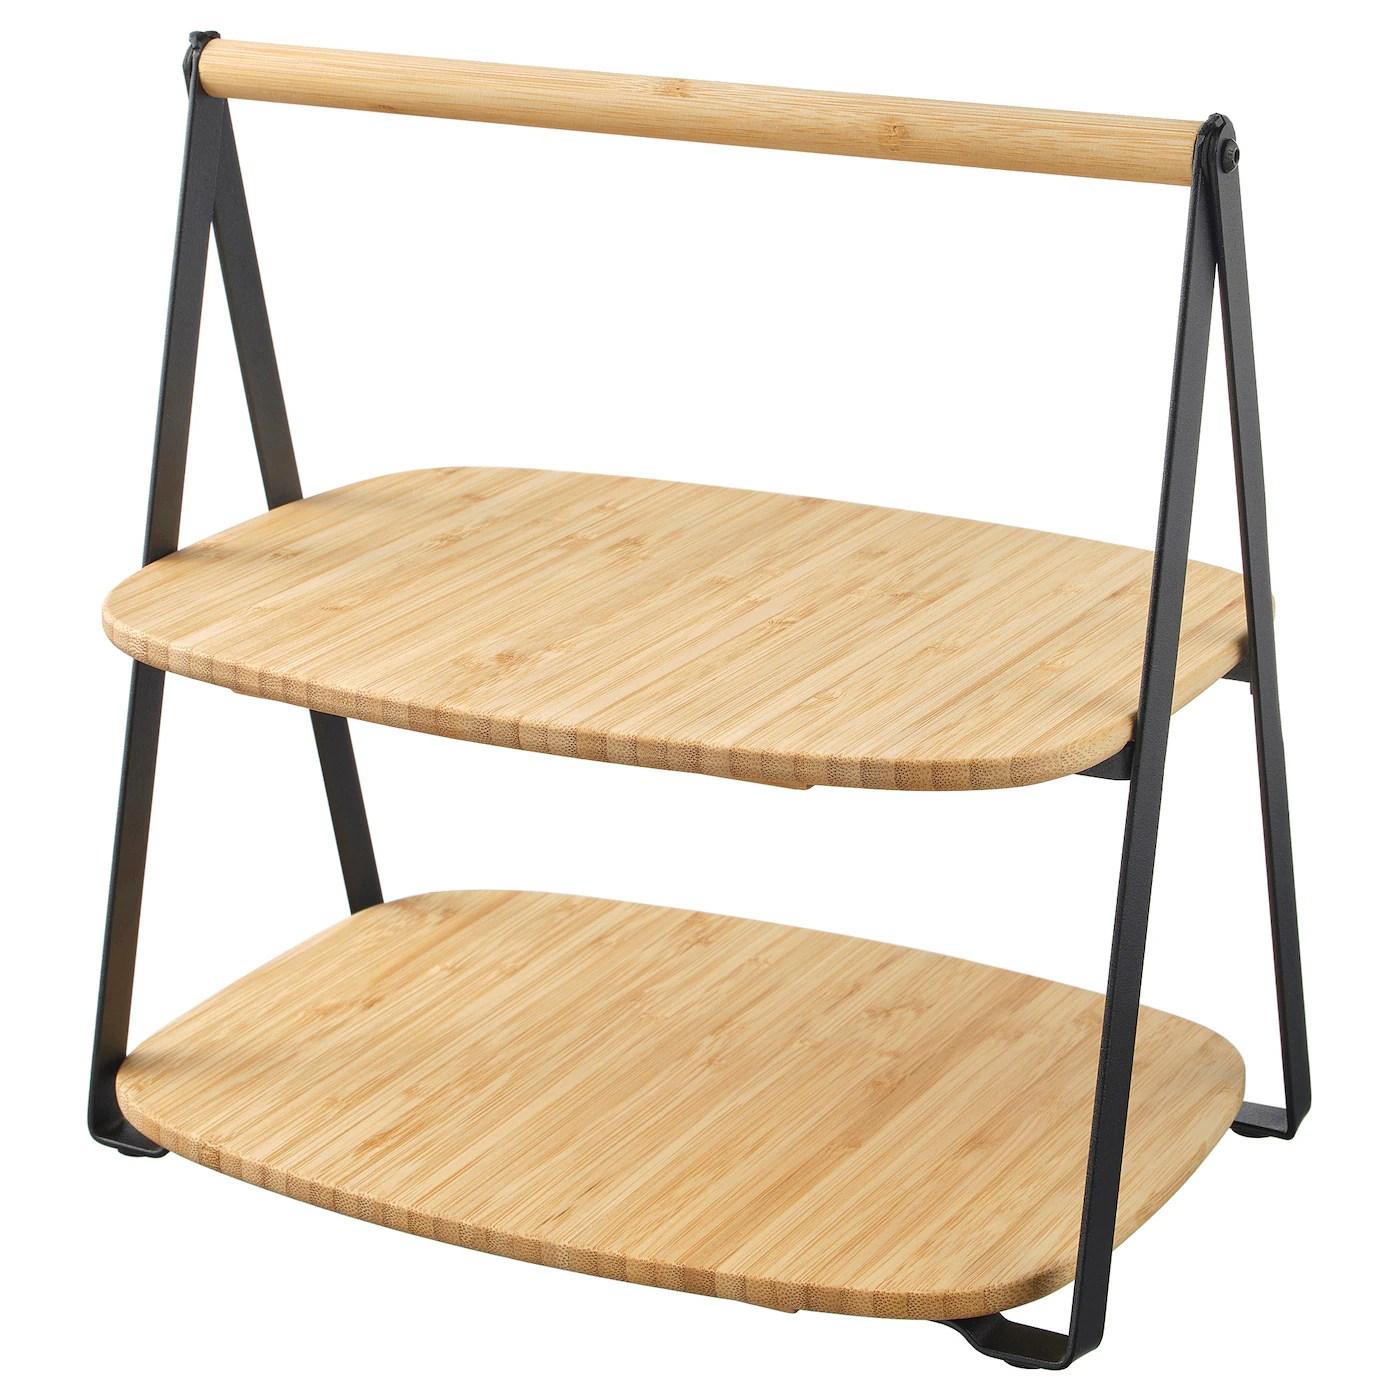 Fullspackad Plateau Bambou Noir Materiau Durable Ikea